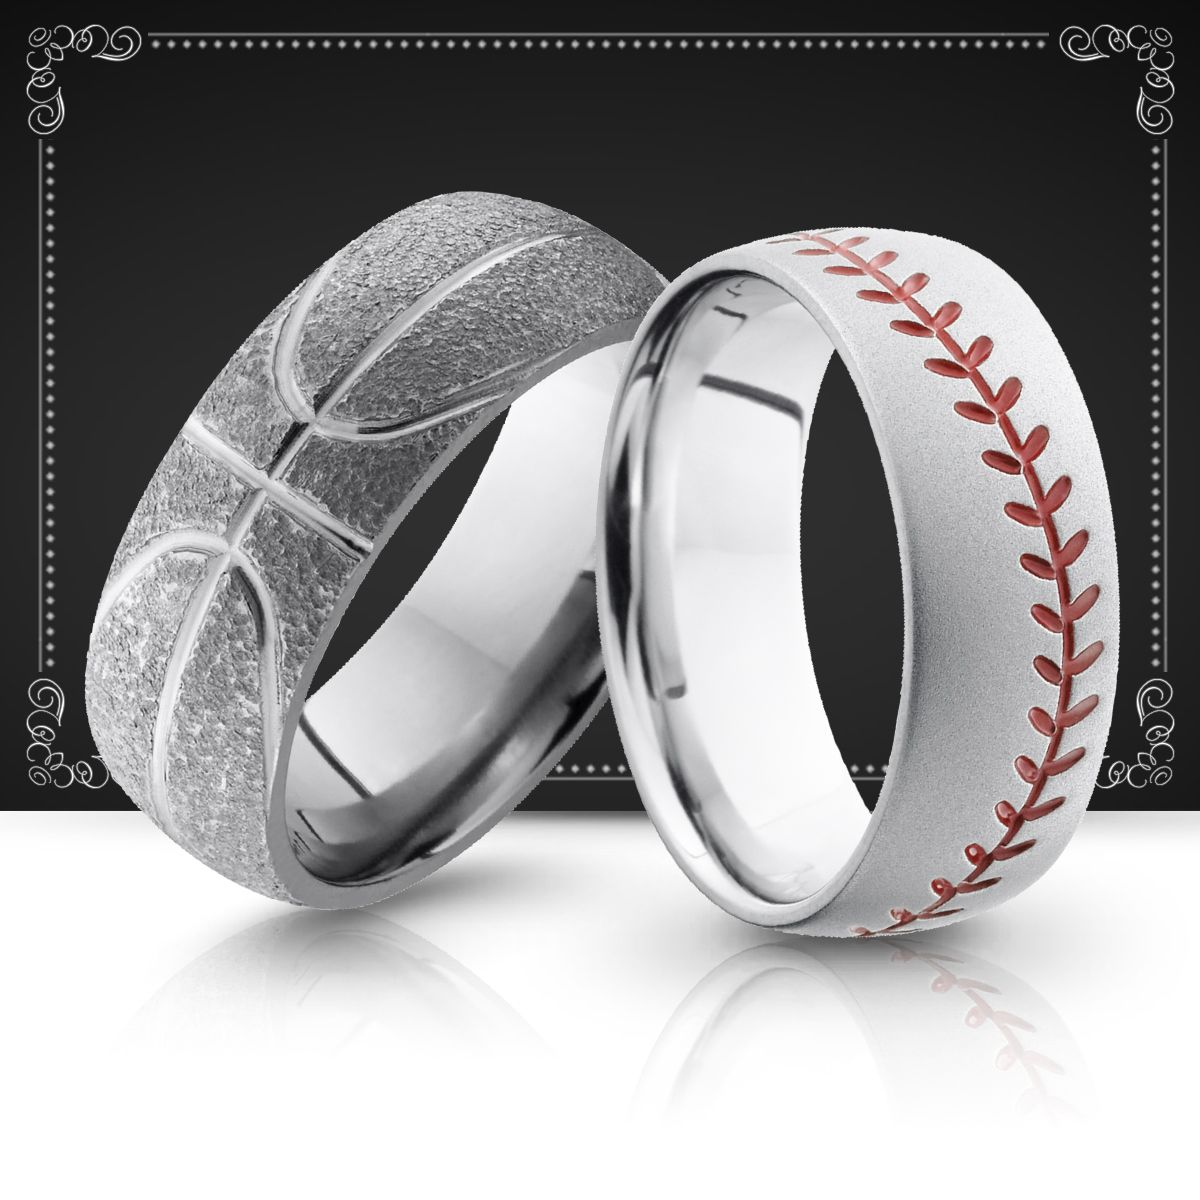 Sports Men's Wedding Bands Wedding Rings  Baseball Basketball